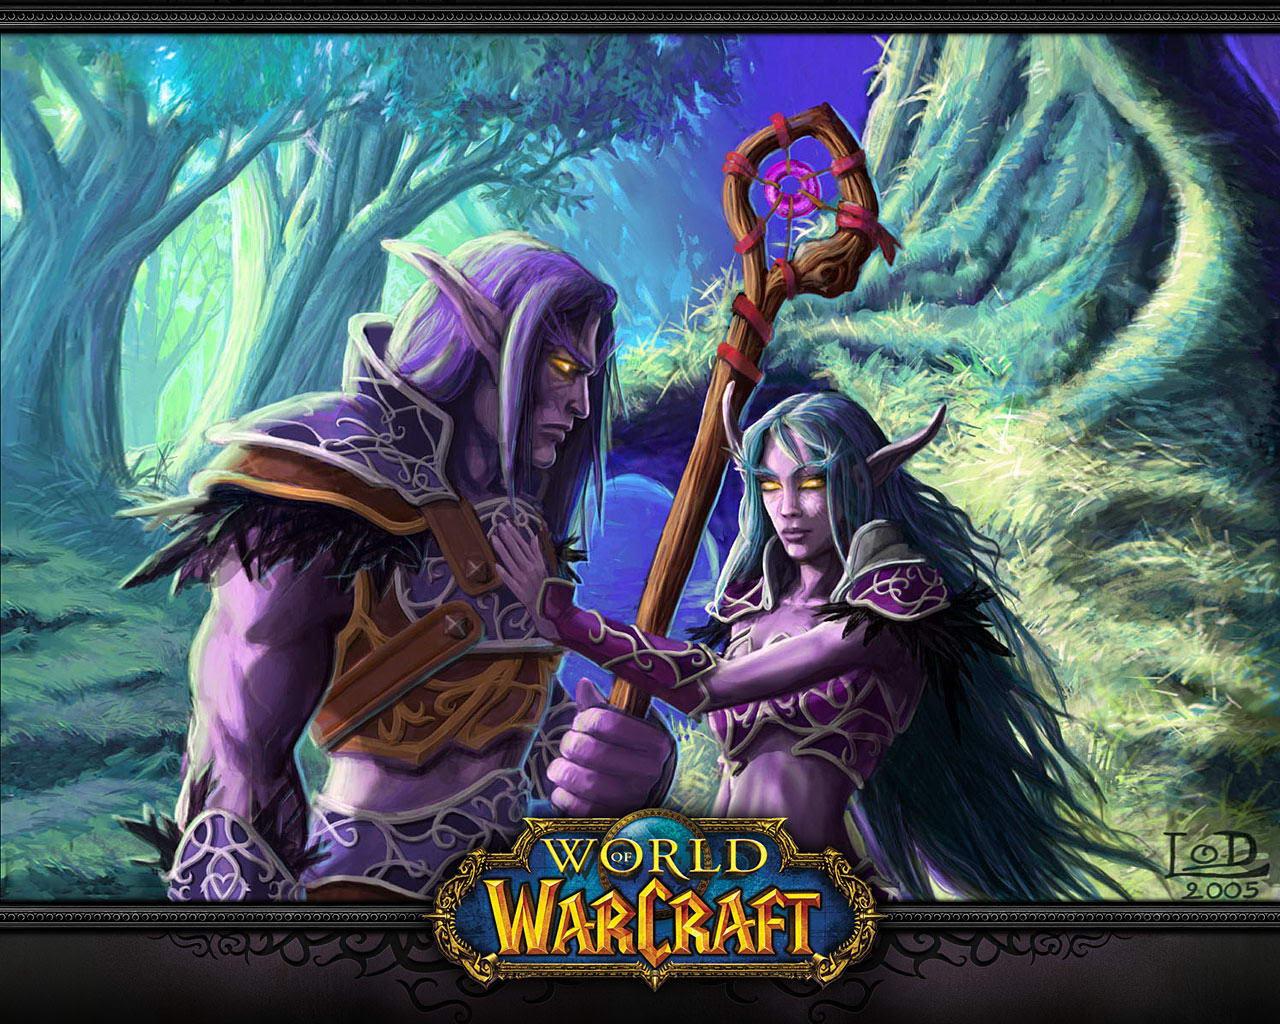 World Of Warcraft Night Elf Wallpaper Sf Wallpaper